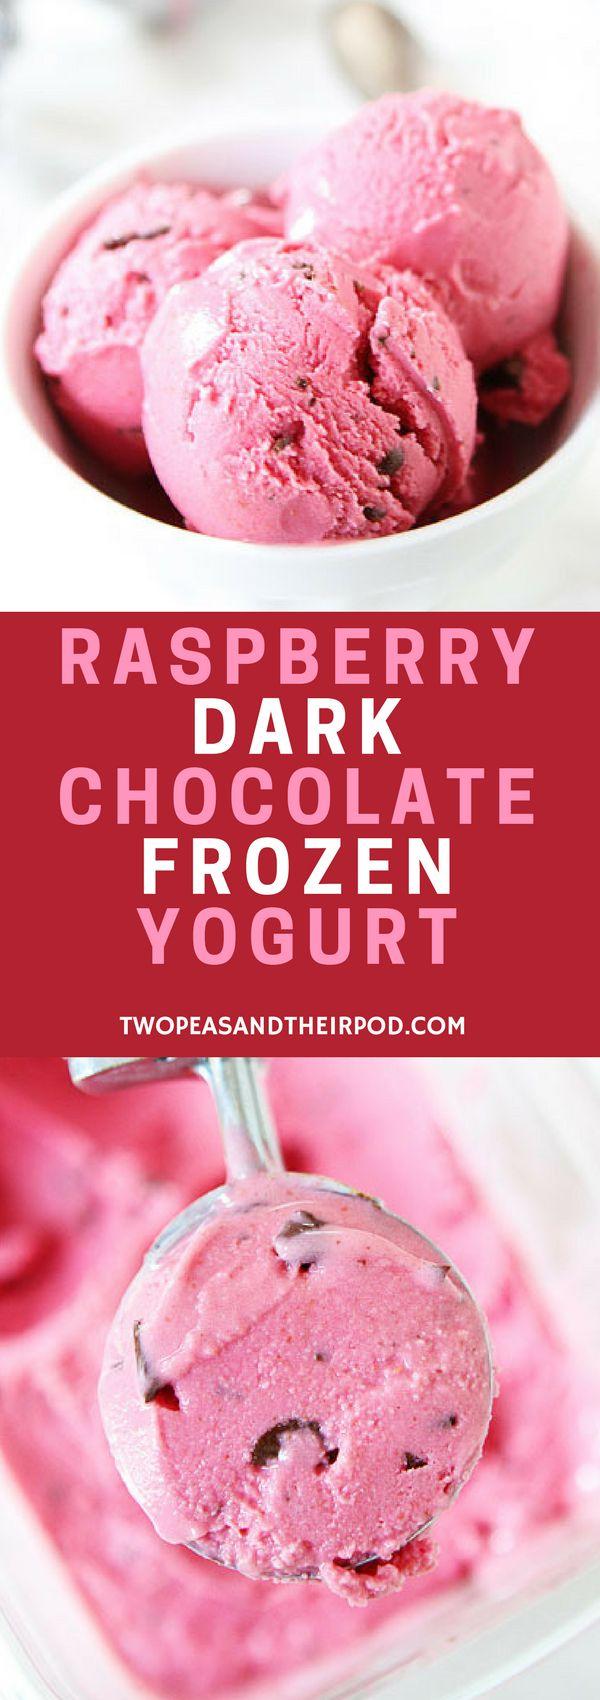 Raspberry Dark Chocolate Frozen Yogurt - It only has 5 ingredients-raspberries, Greek yogurt, vanilla, sugar, and dark chocolate. This is definitely a stress-free frozen yogurt! For more easy and delicious dessert recipes, check us out @twopeasandpod #desserts #sweettooth #easyrecipe